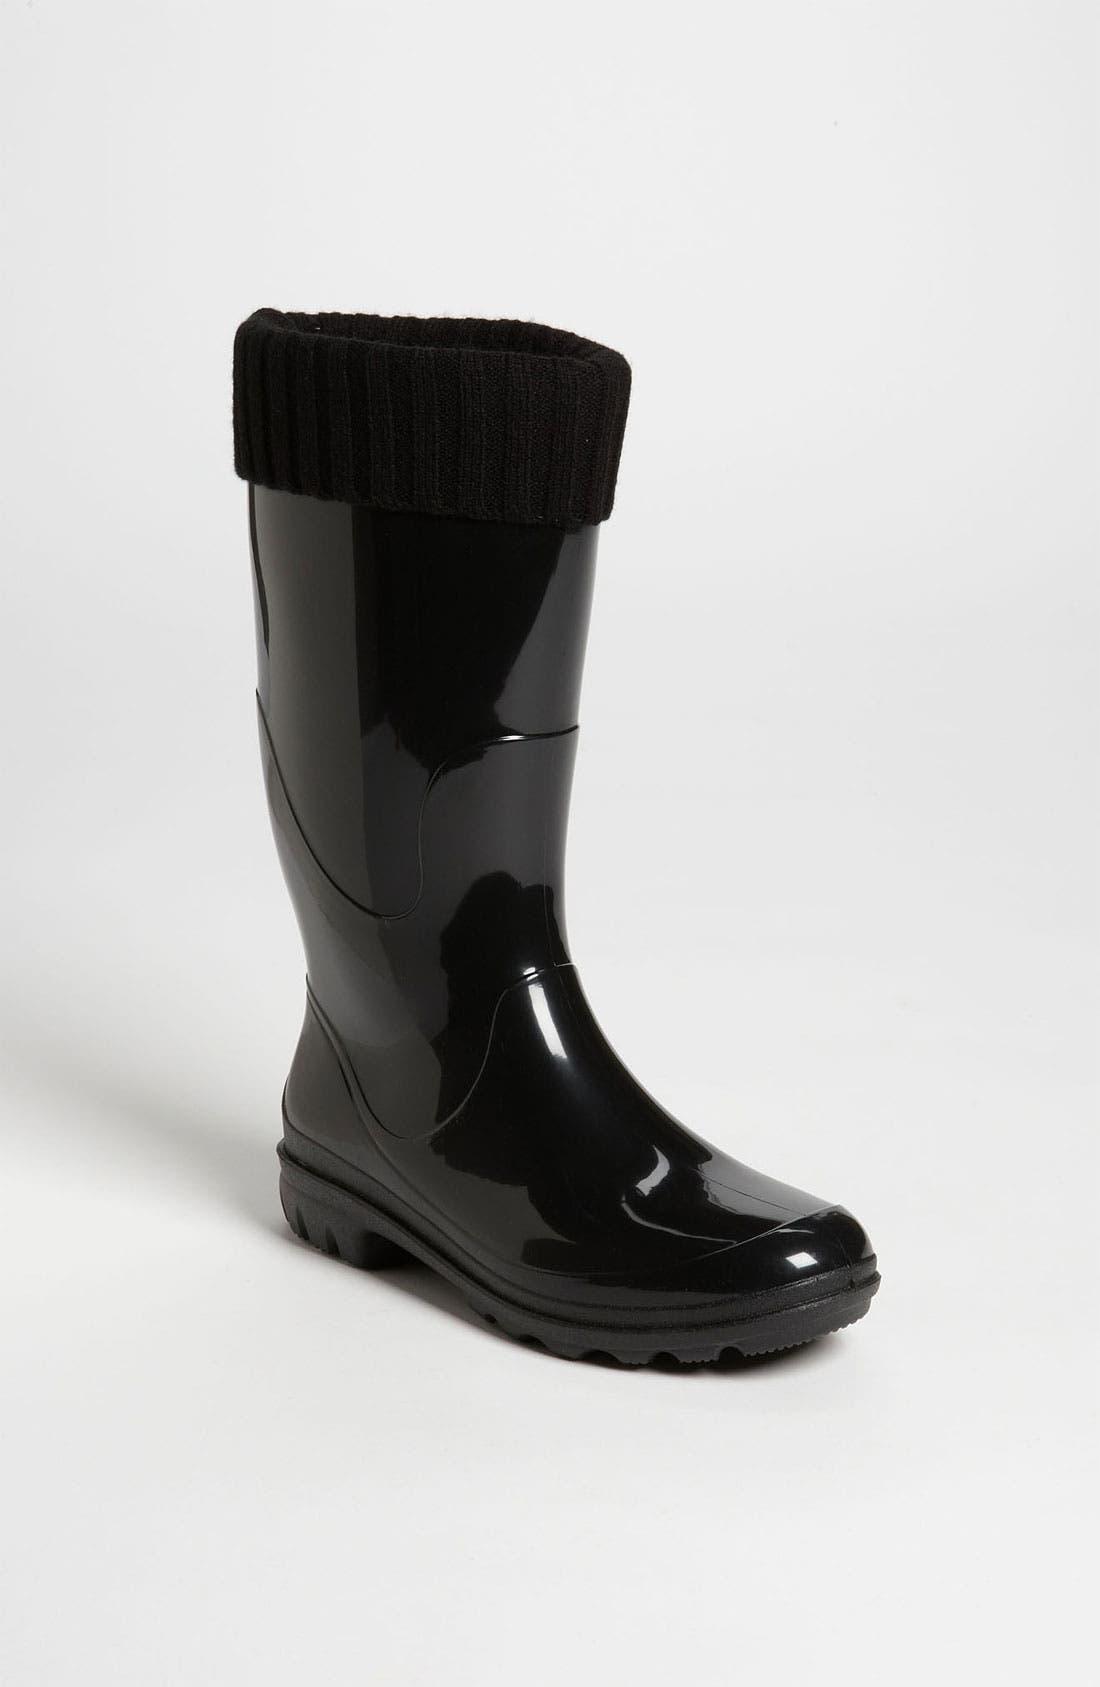 Alternate Image 1 Selected - Kamik 'Kelly' Rain Boot (Women) (Online Only)